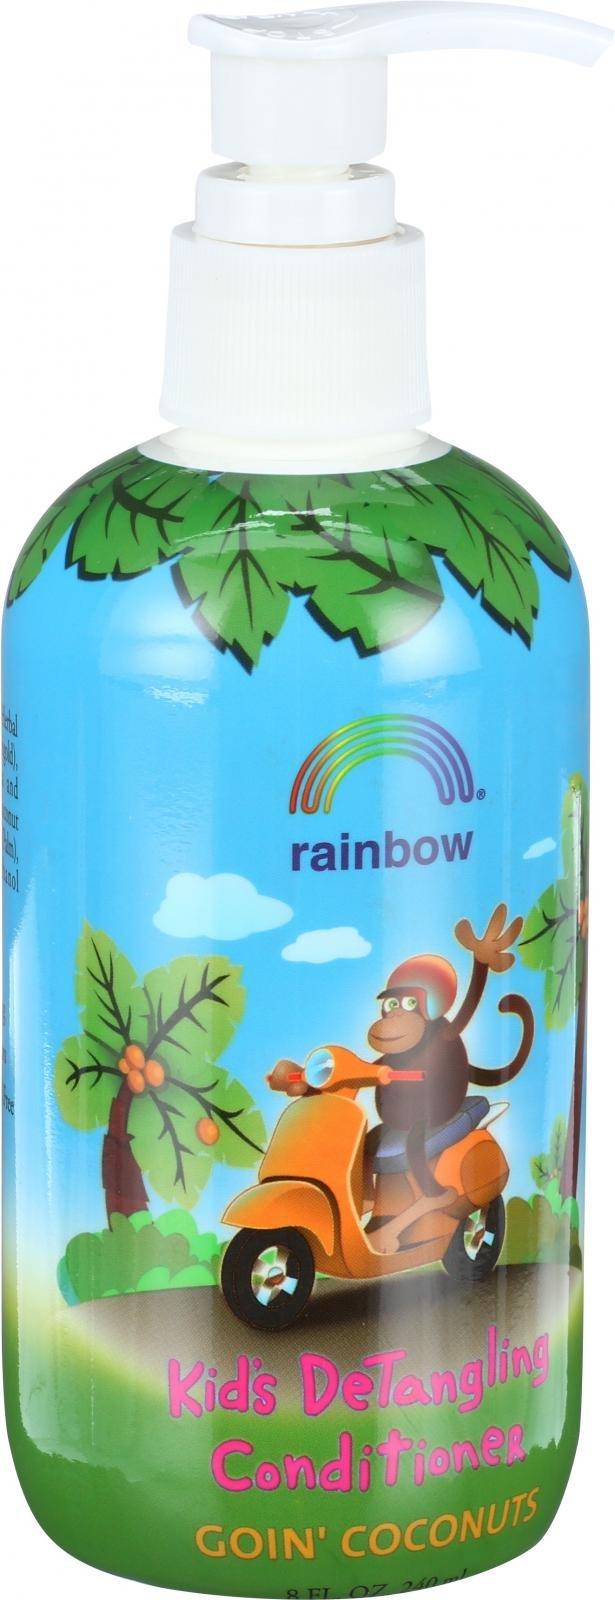 Rainbow Research Kids Detangling Conditioner - Goin Coconuts - 8 oz - Gluten Free -